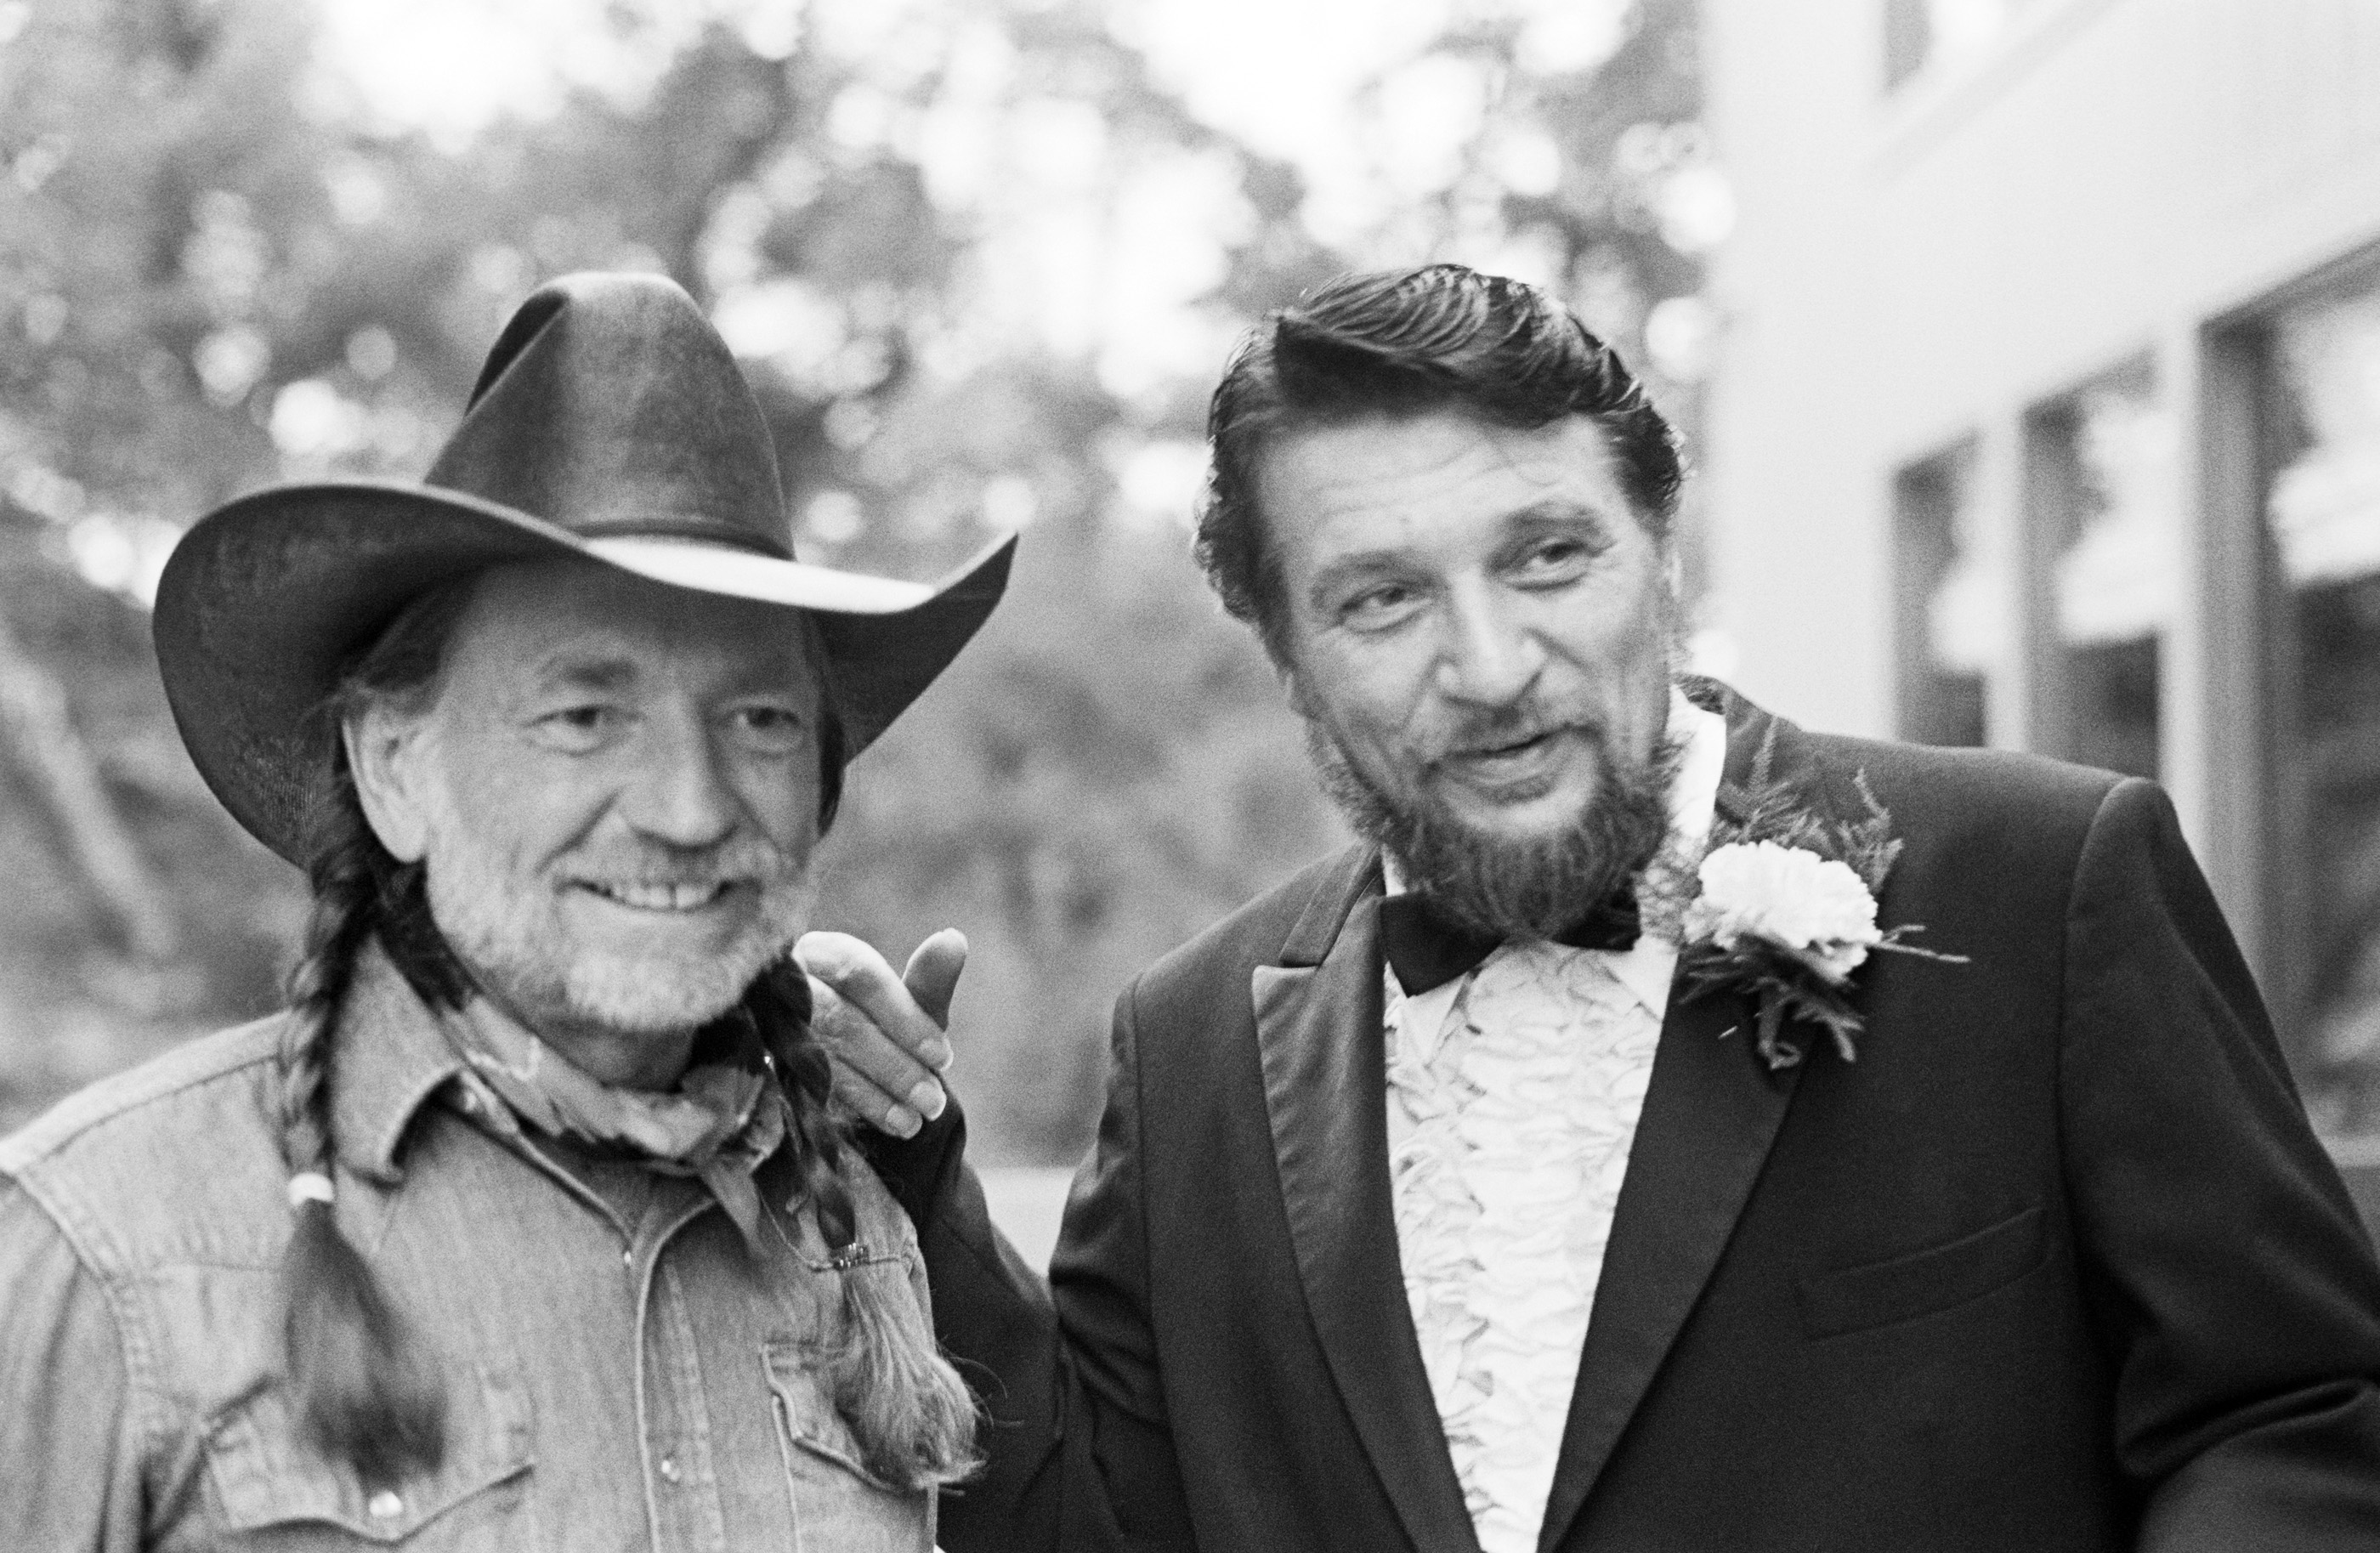 Stuart: Willie and Waylon, 1985